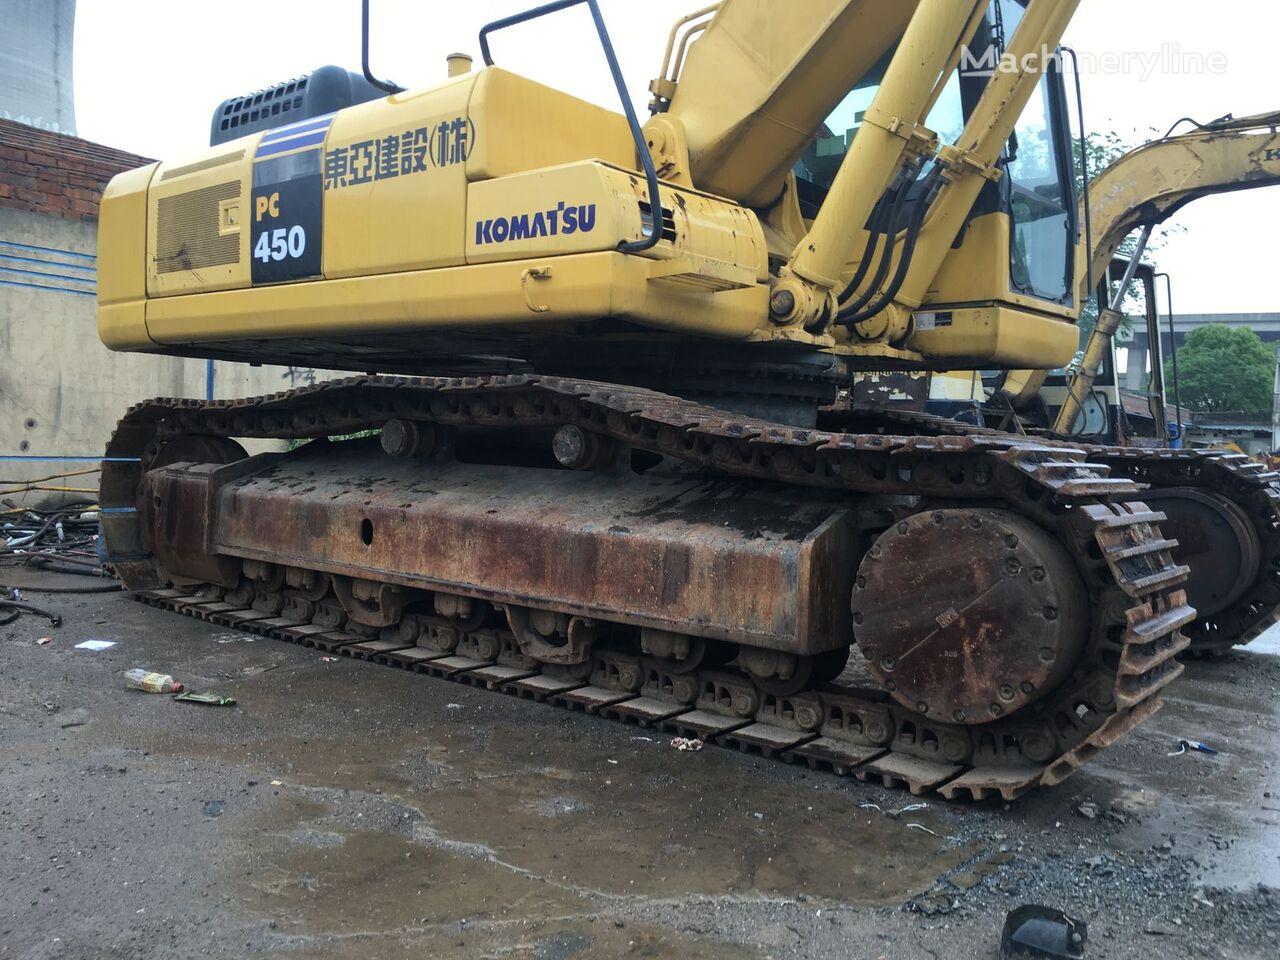 KOMATSU PC450-7 tracked excavator